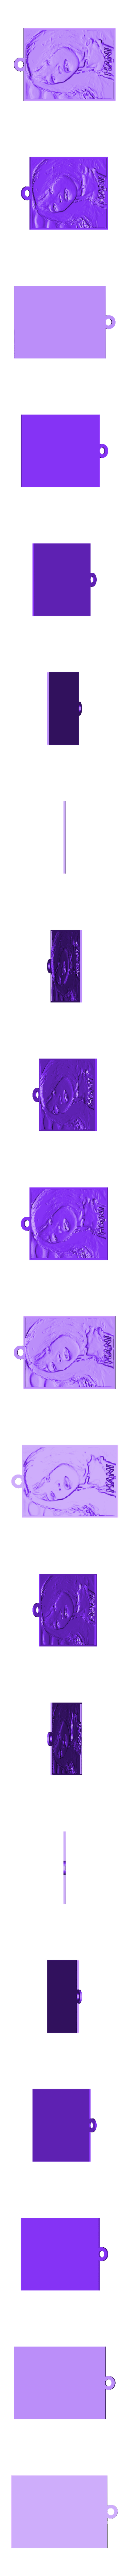 lithopane_new_20200505-66-3vgmck.stl Download free STL file My Customized LithopaneBEE HANI • 3D printer model, atarka3